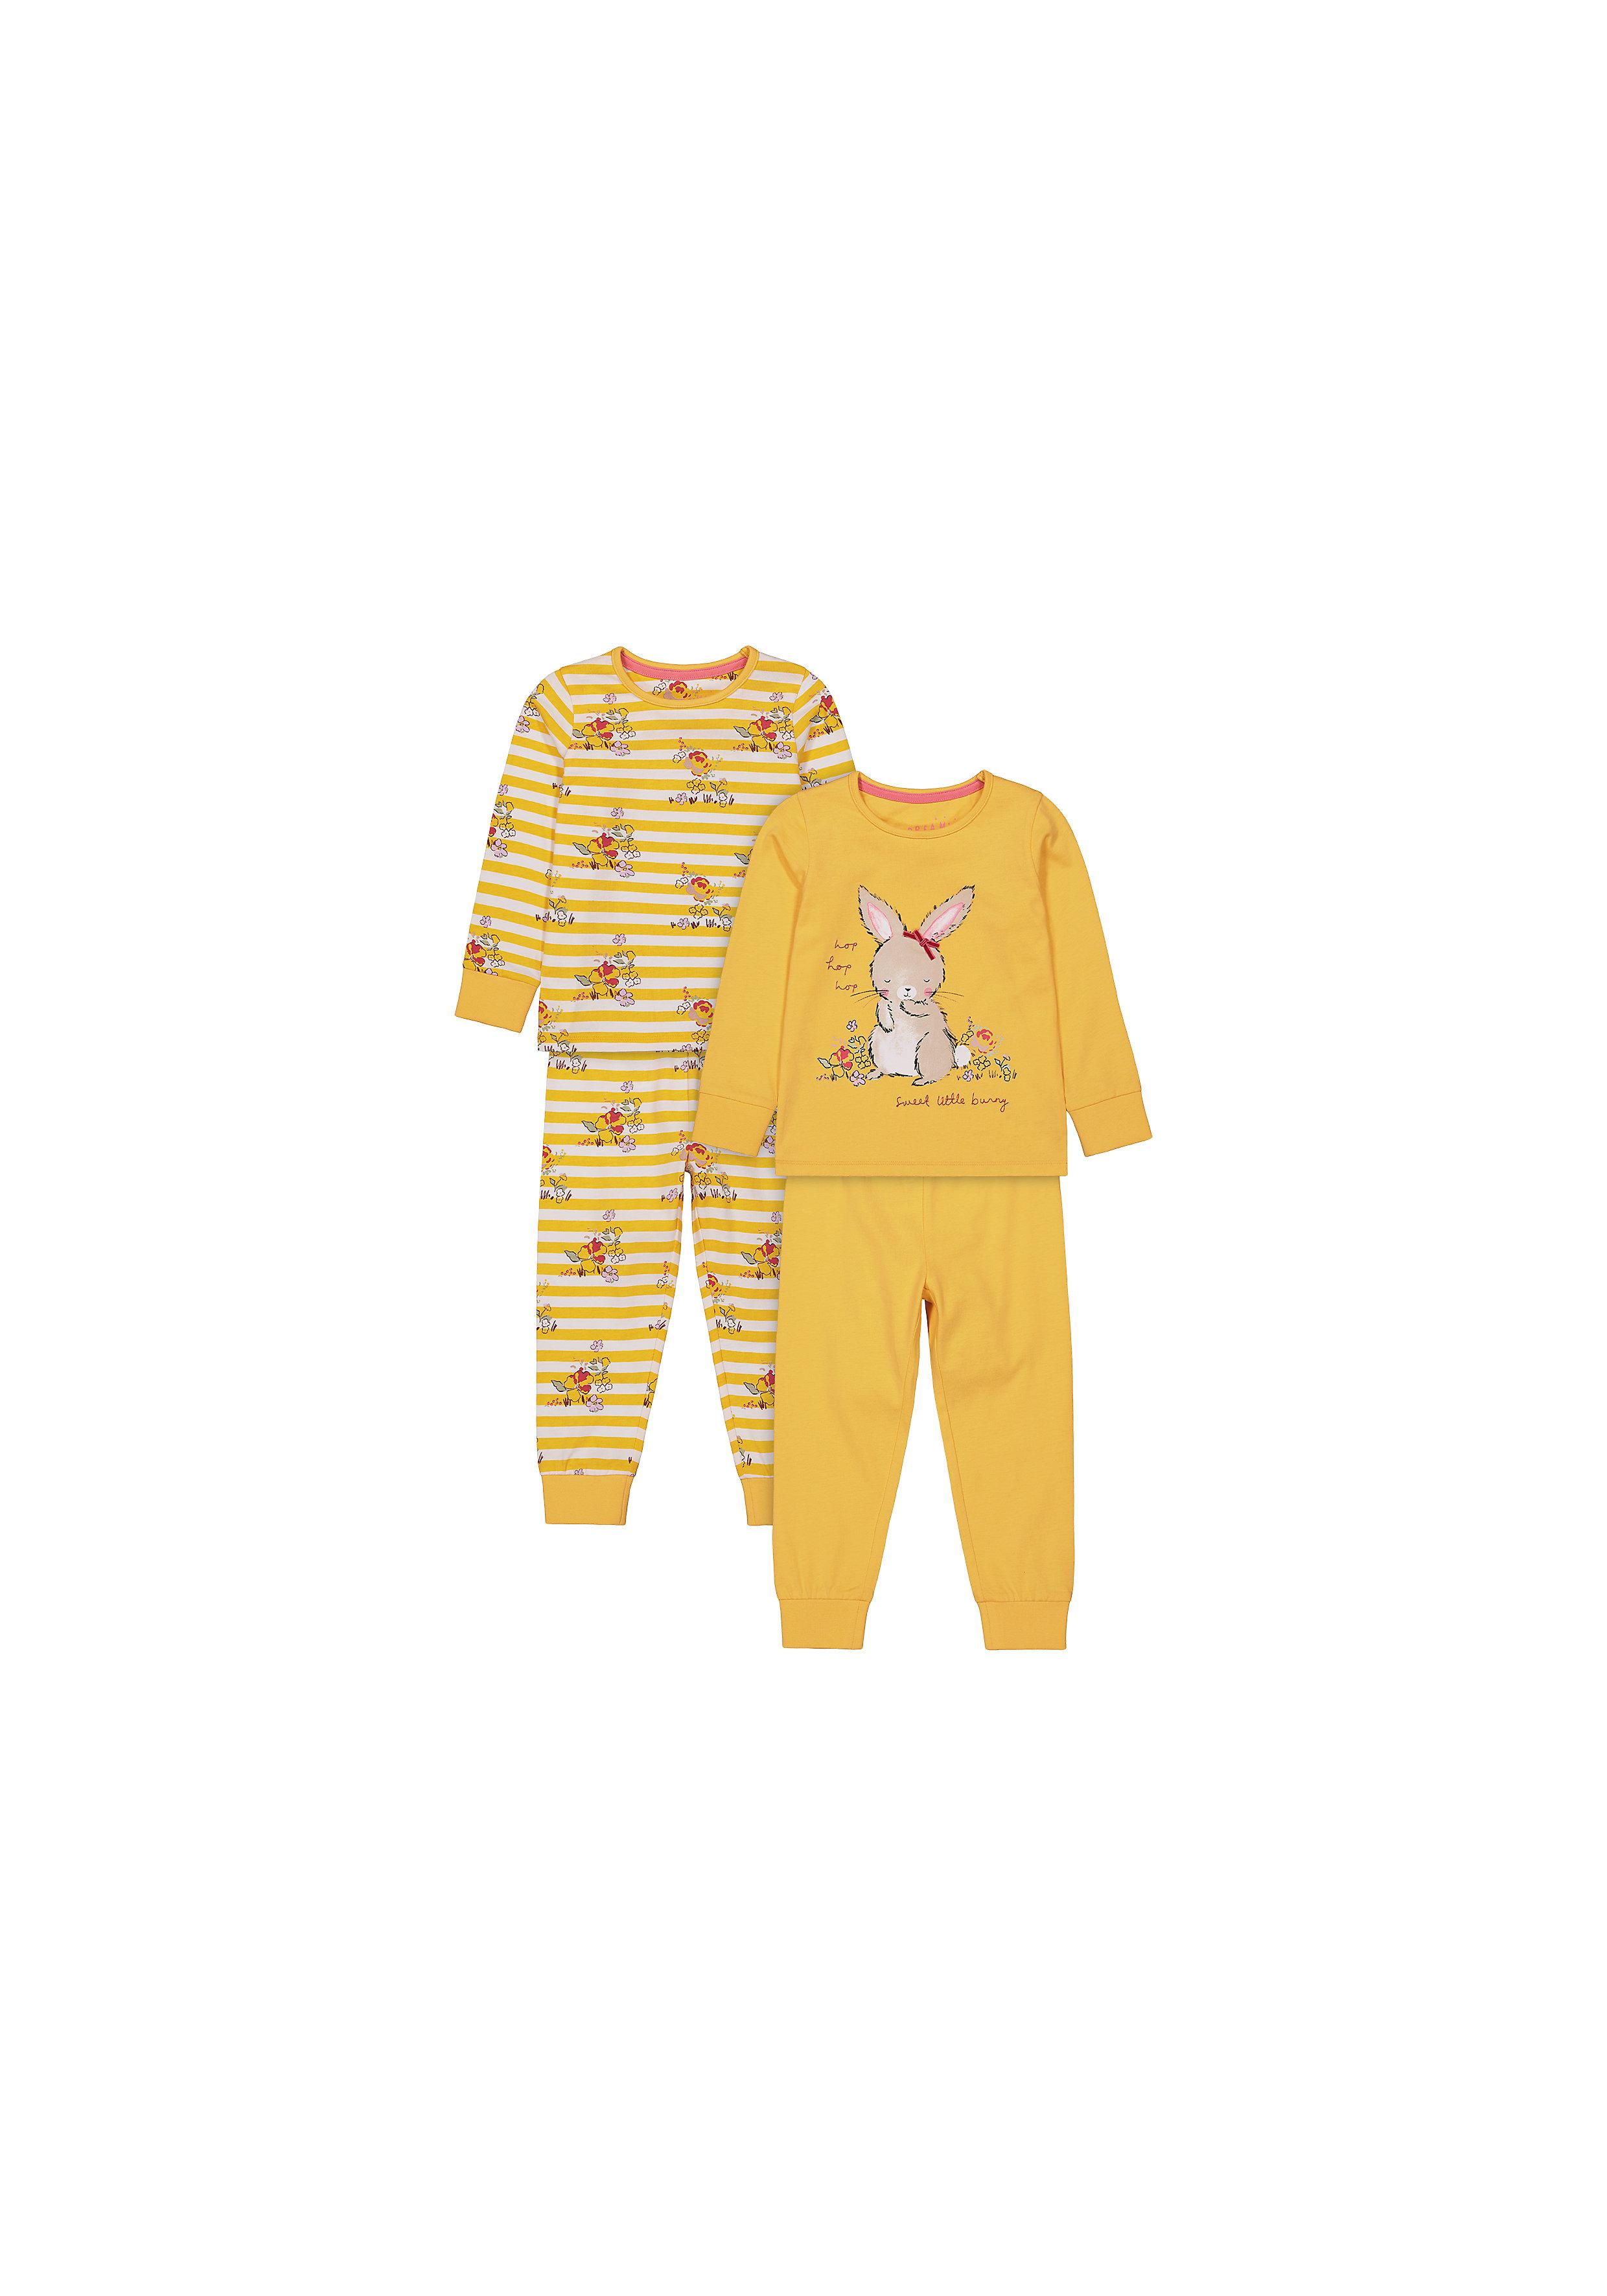 Mothercare | Girls Full Sleeves Pyjama Sets - Pack Of 2 - Mustard